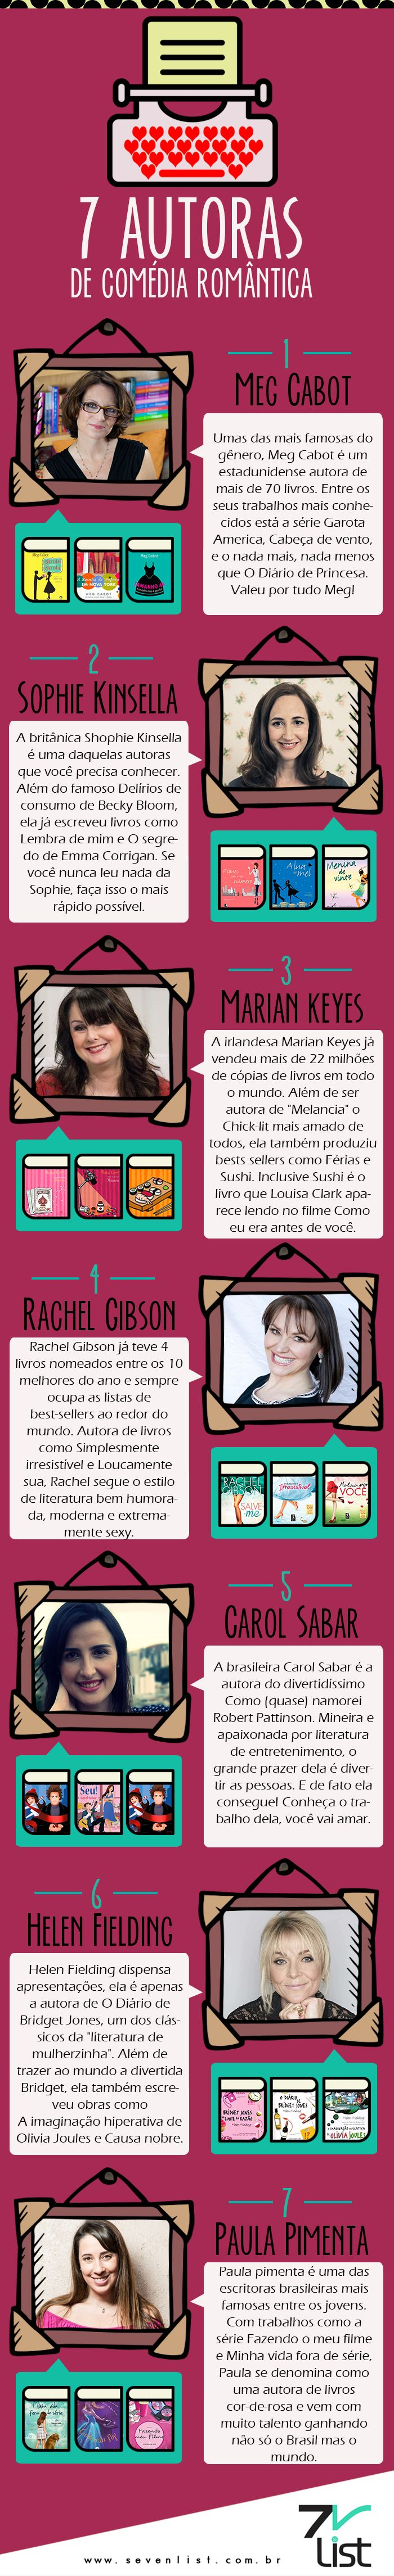 #Infográfico #Design #Blog #Ler #Read #Comédiaromântica #Book #leitura #HelenFielding #Megcabot #Sophiekinsella #CarolSabar  #MarianKeyes #Paulapimenta #RachelGibson www.sevenlist.com.br